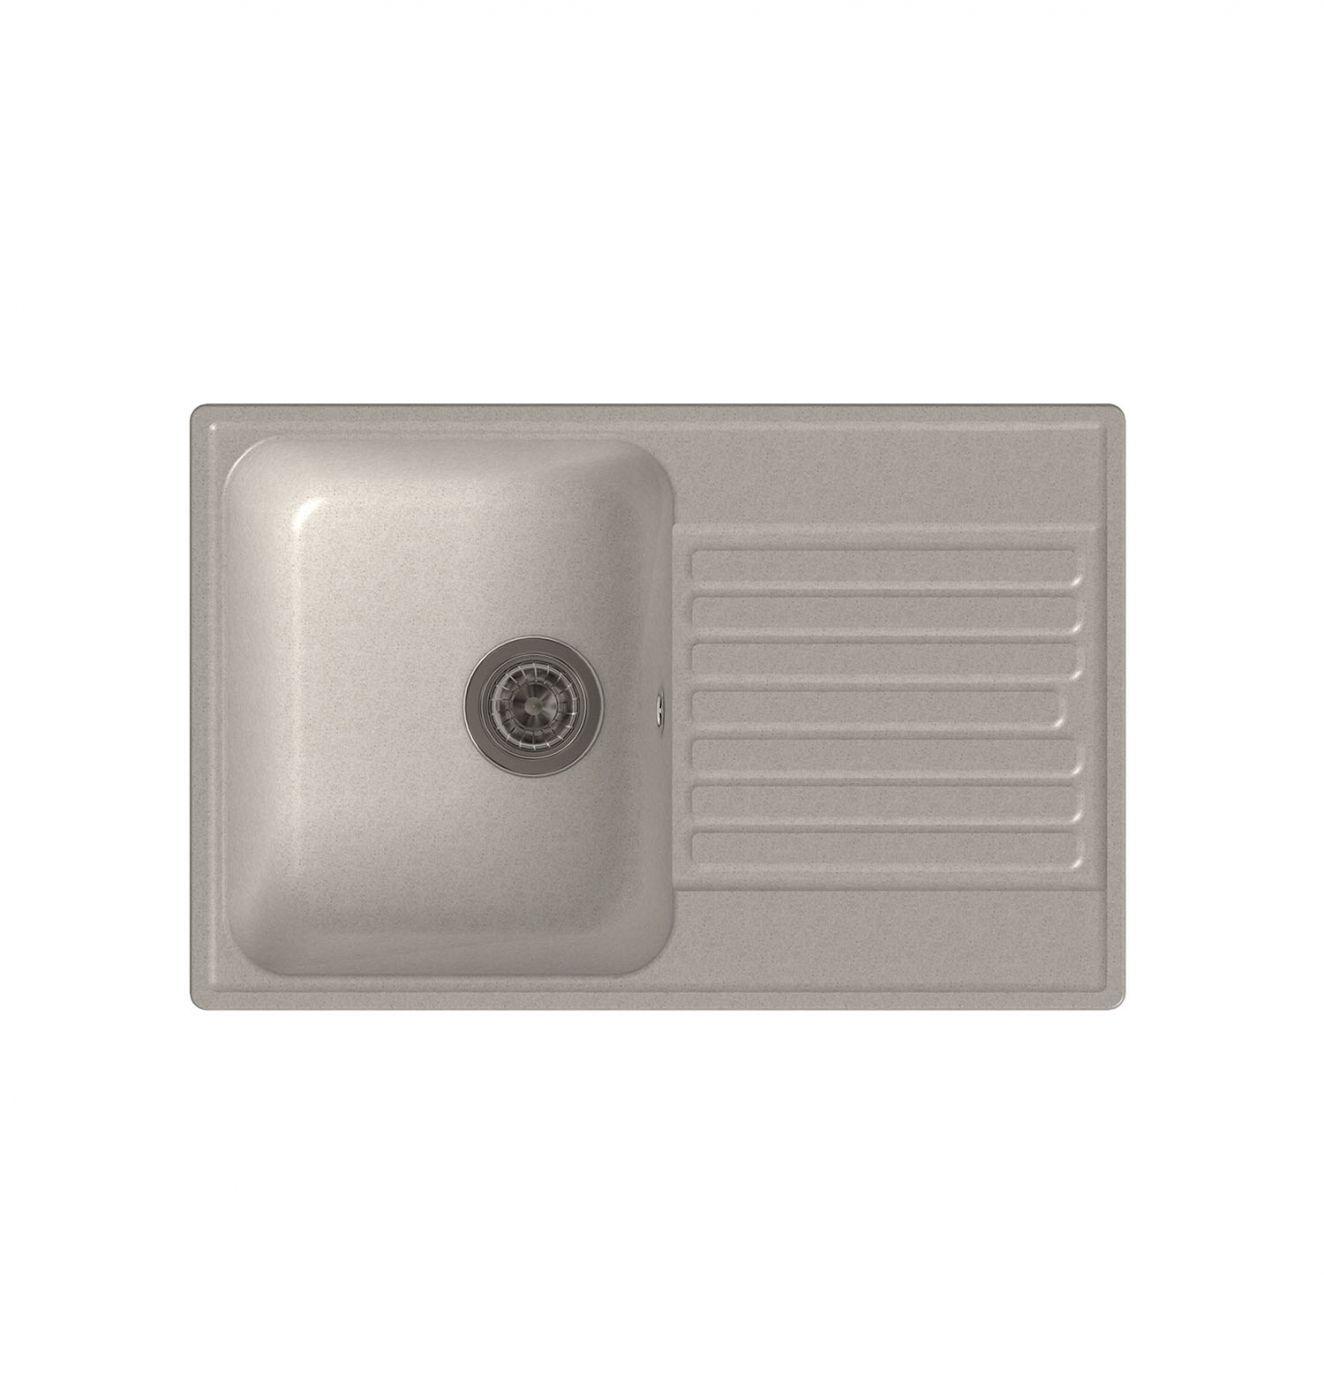 Врезная кухонная мойка LEX Geneva 740 White  74х48см полимер RULE000019